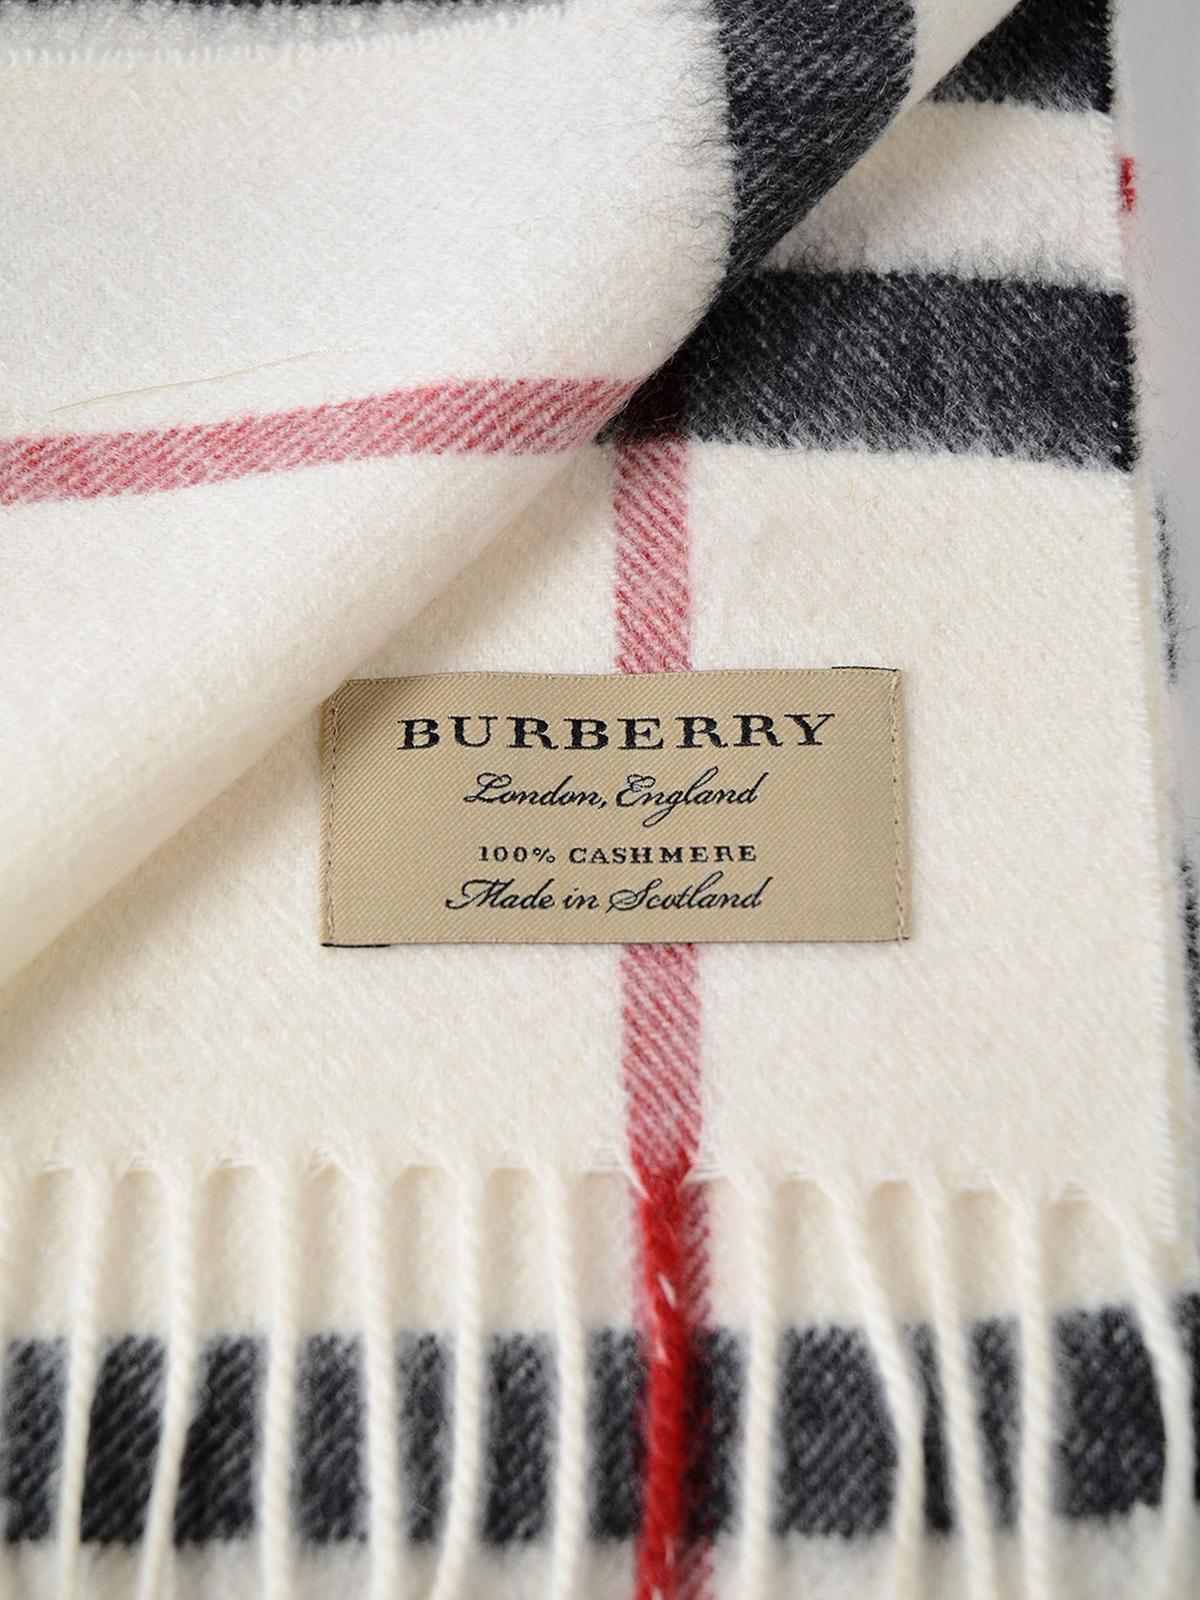 c01f1d7e3052 Burberry - Écharpe - Blanc - Écharpes - 4058352   iKRIX.com